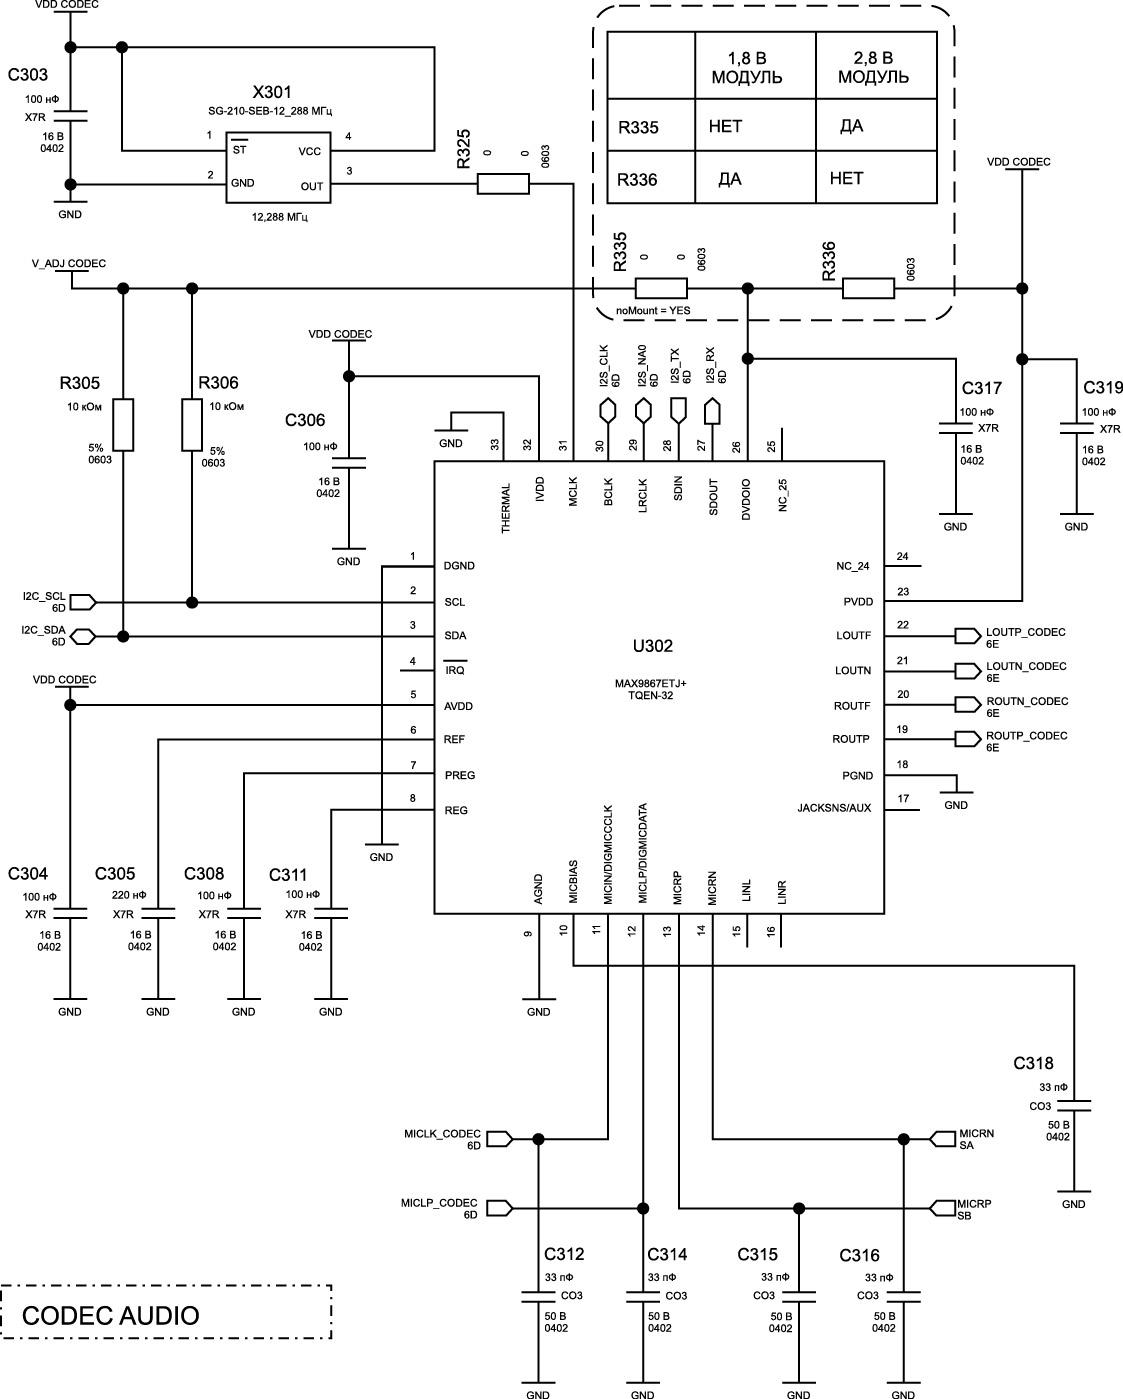 Цифровой аудиоинтерфейс (DVI)